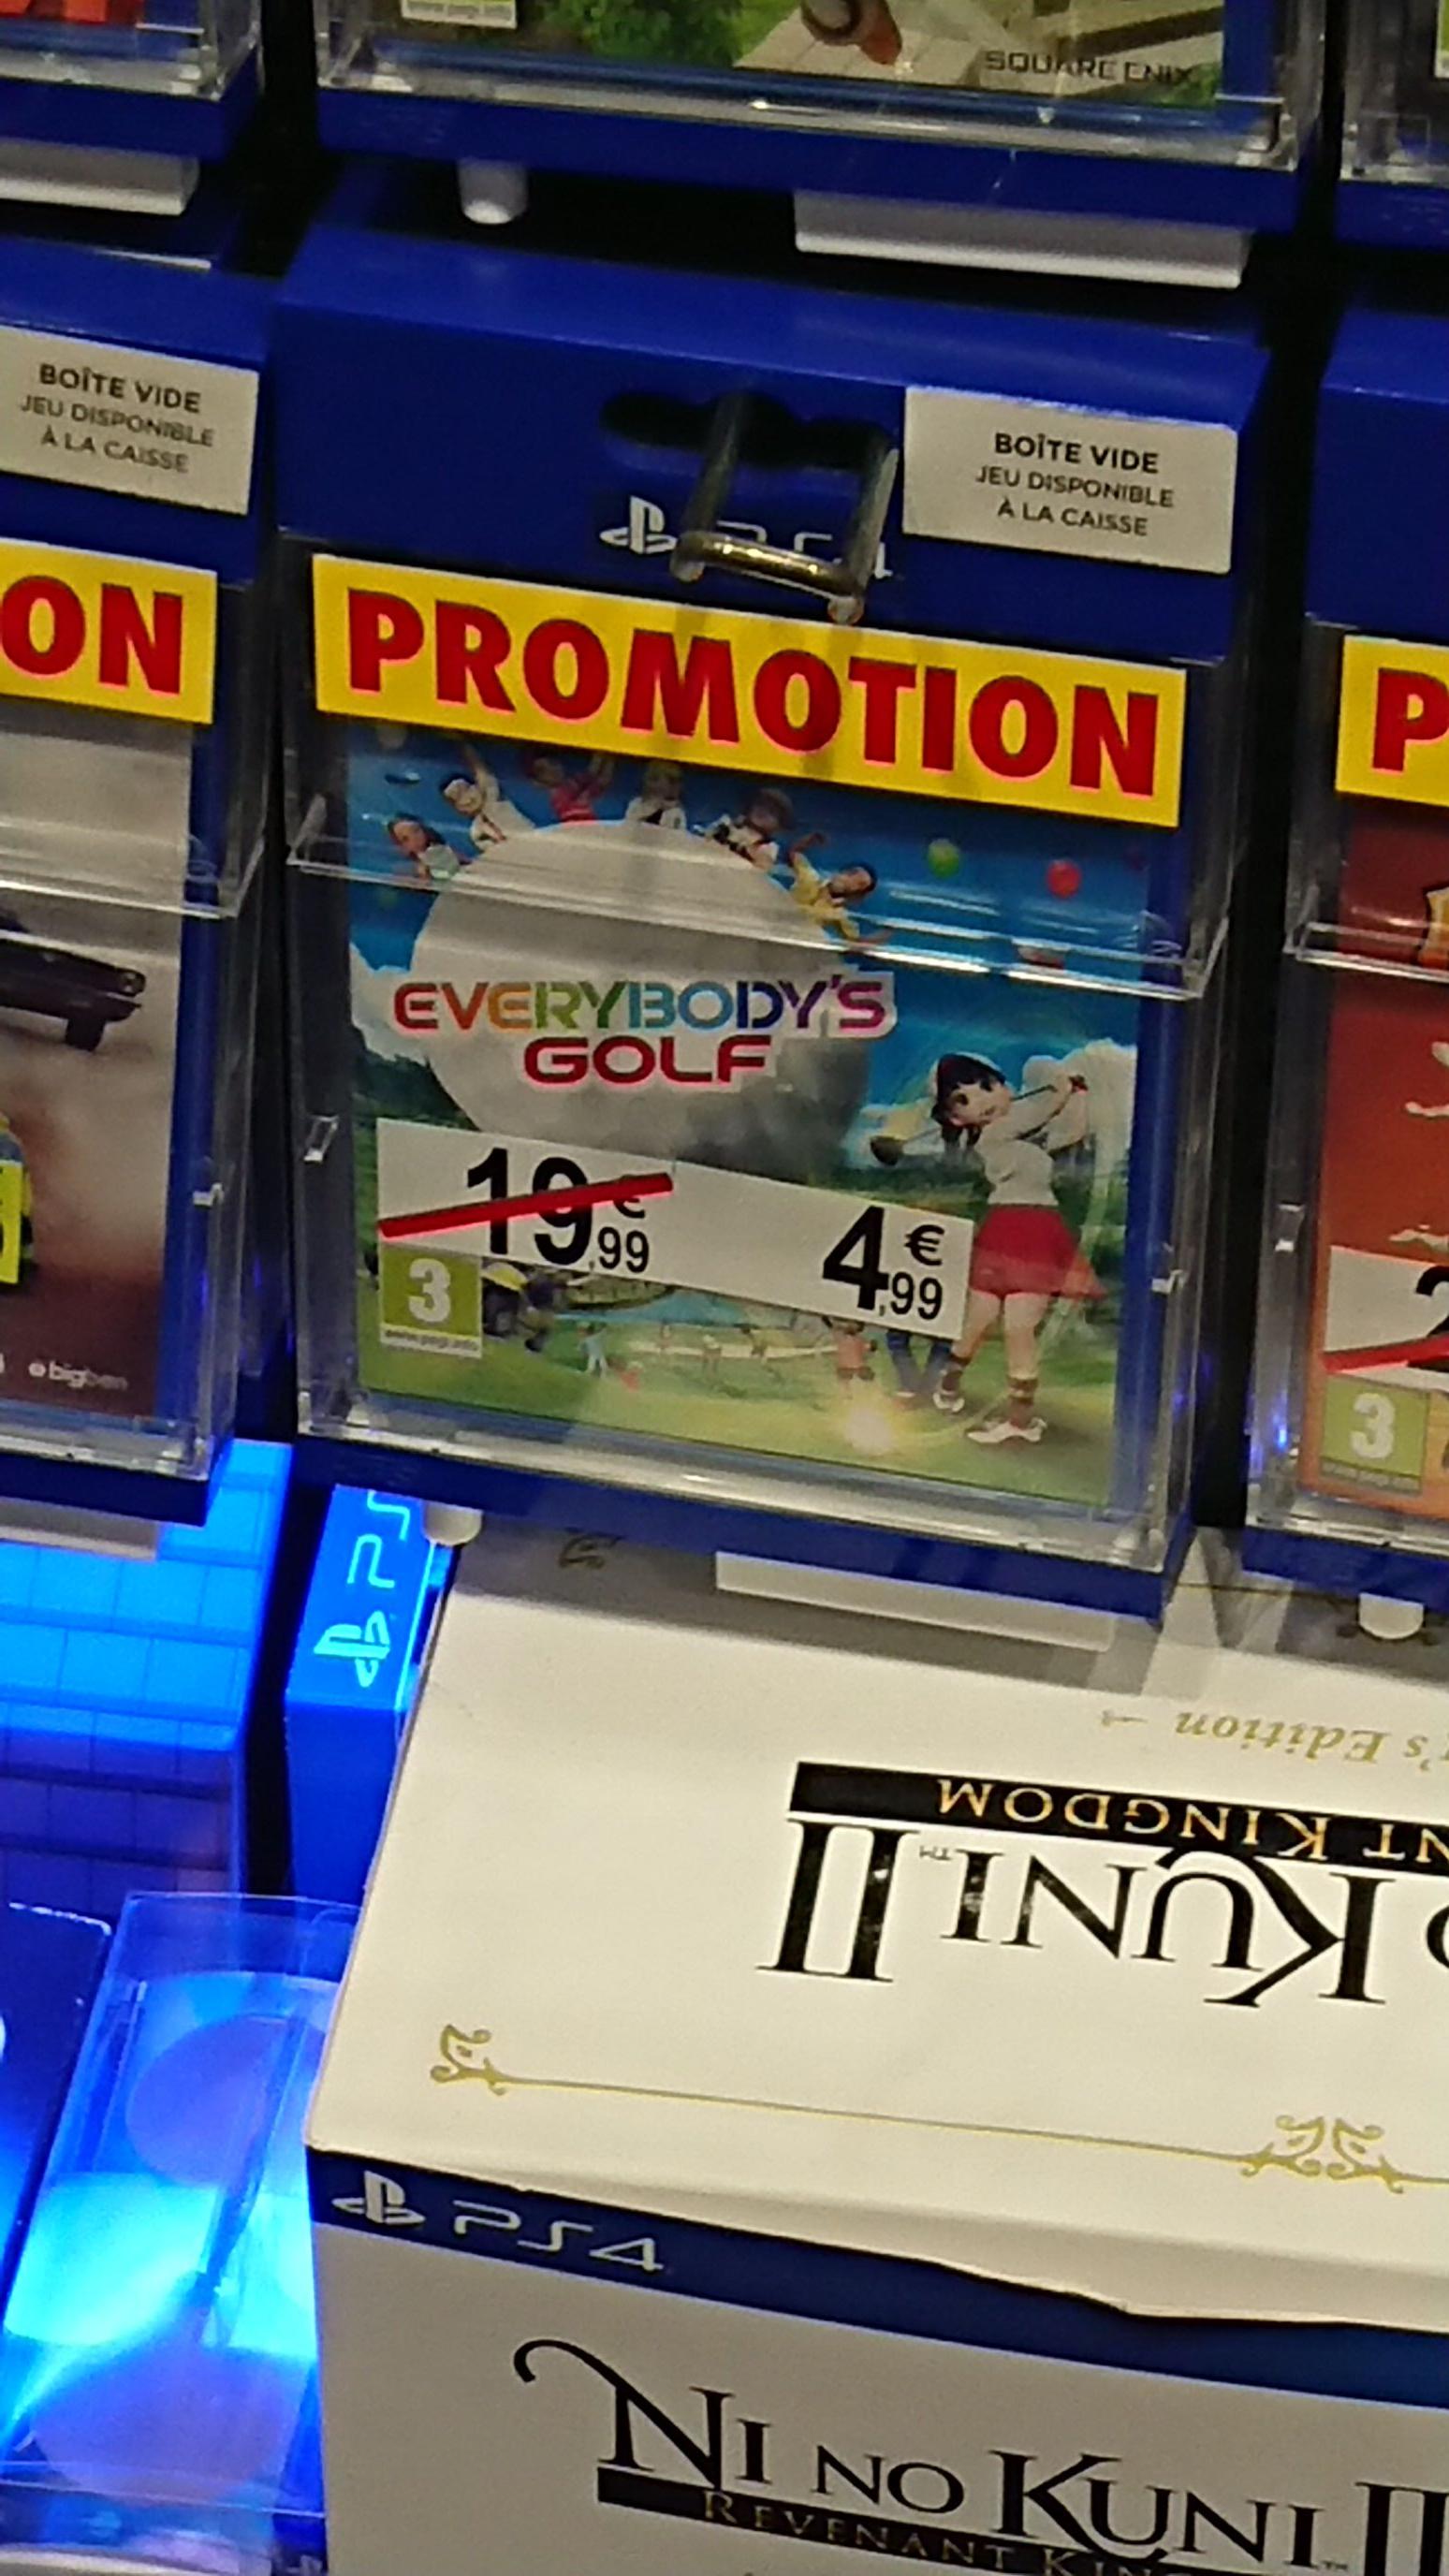 Everybody's Golf sur PS4 - Paris Italie 2 13ème (75)